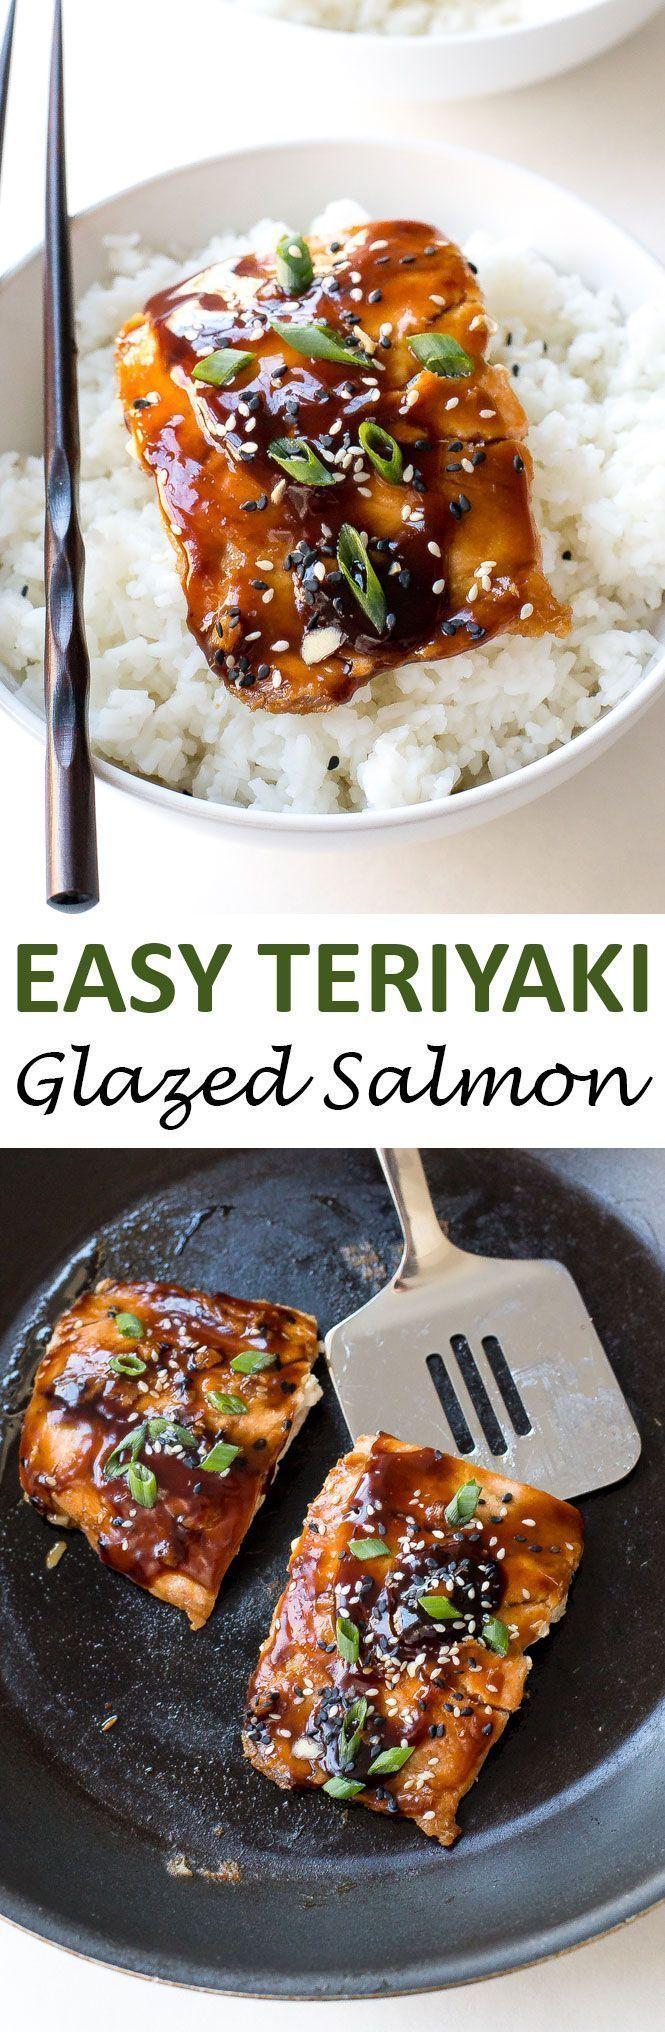 Easy Teriyaki Salmon pan-fried to perfection and served with a homemade teriyaki sauce! Serve with rice and veggies to make it a meal! | chefsavvy.com #recipe #seafood #teriyaki #salmon #asian